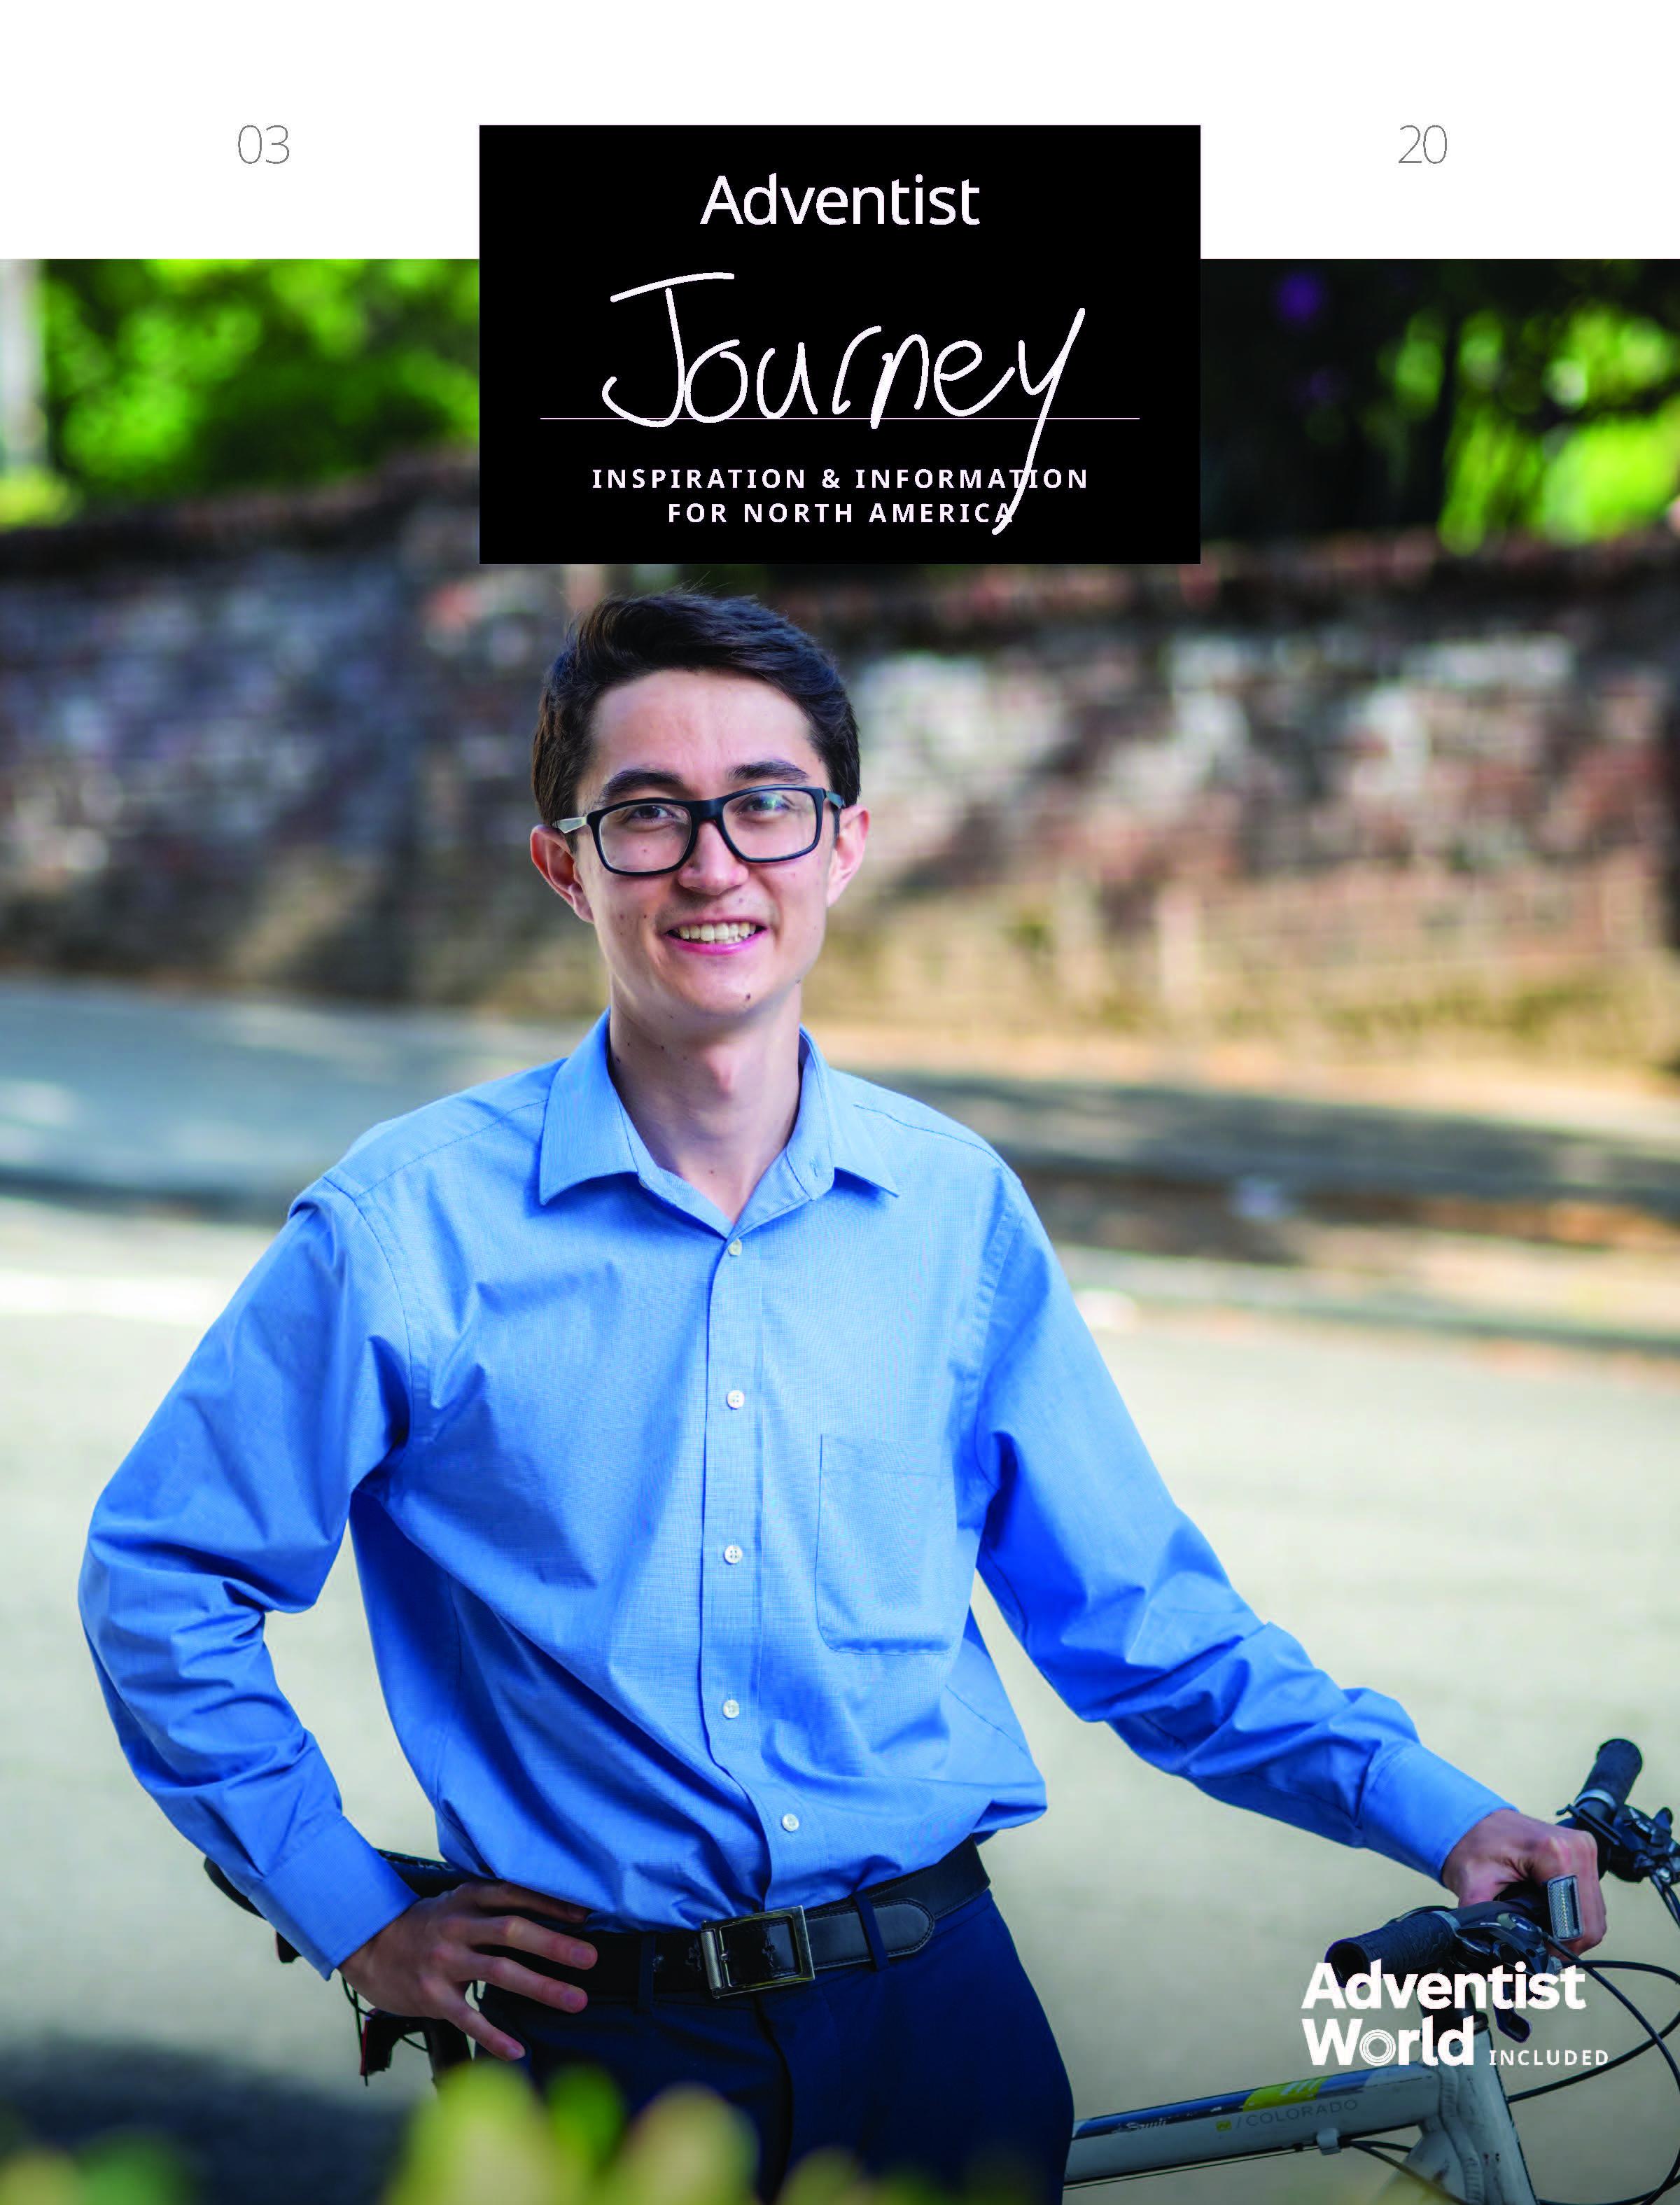 March Adventist Journey cover - John Van Patten